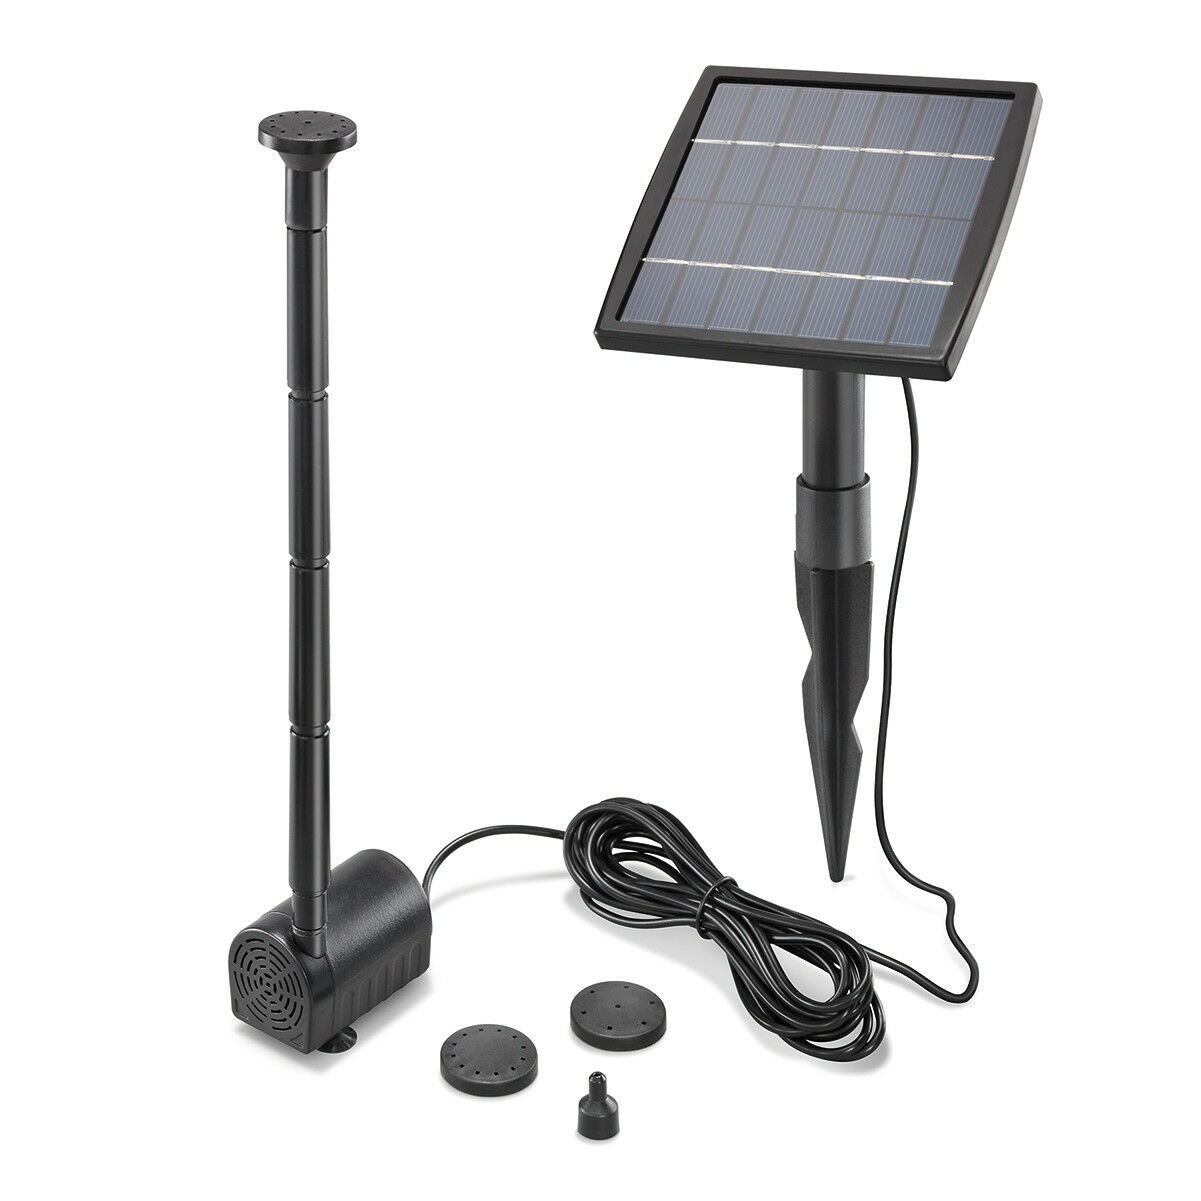 Solar Teichpumpe 1,5W 140l/h Solarpumpe Gartenteich Set Pumpenset esotec 101905